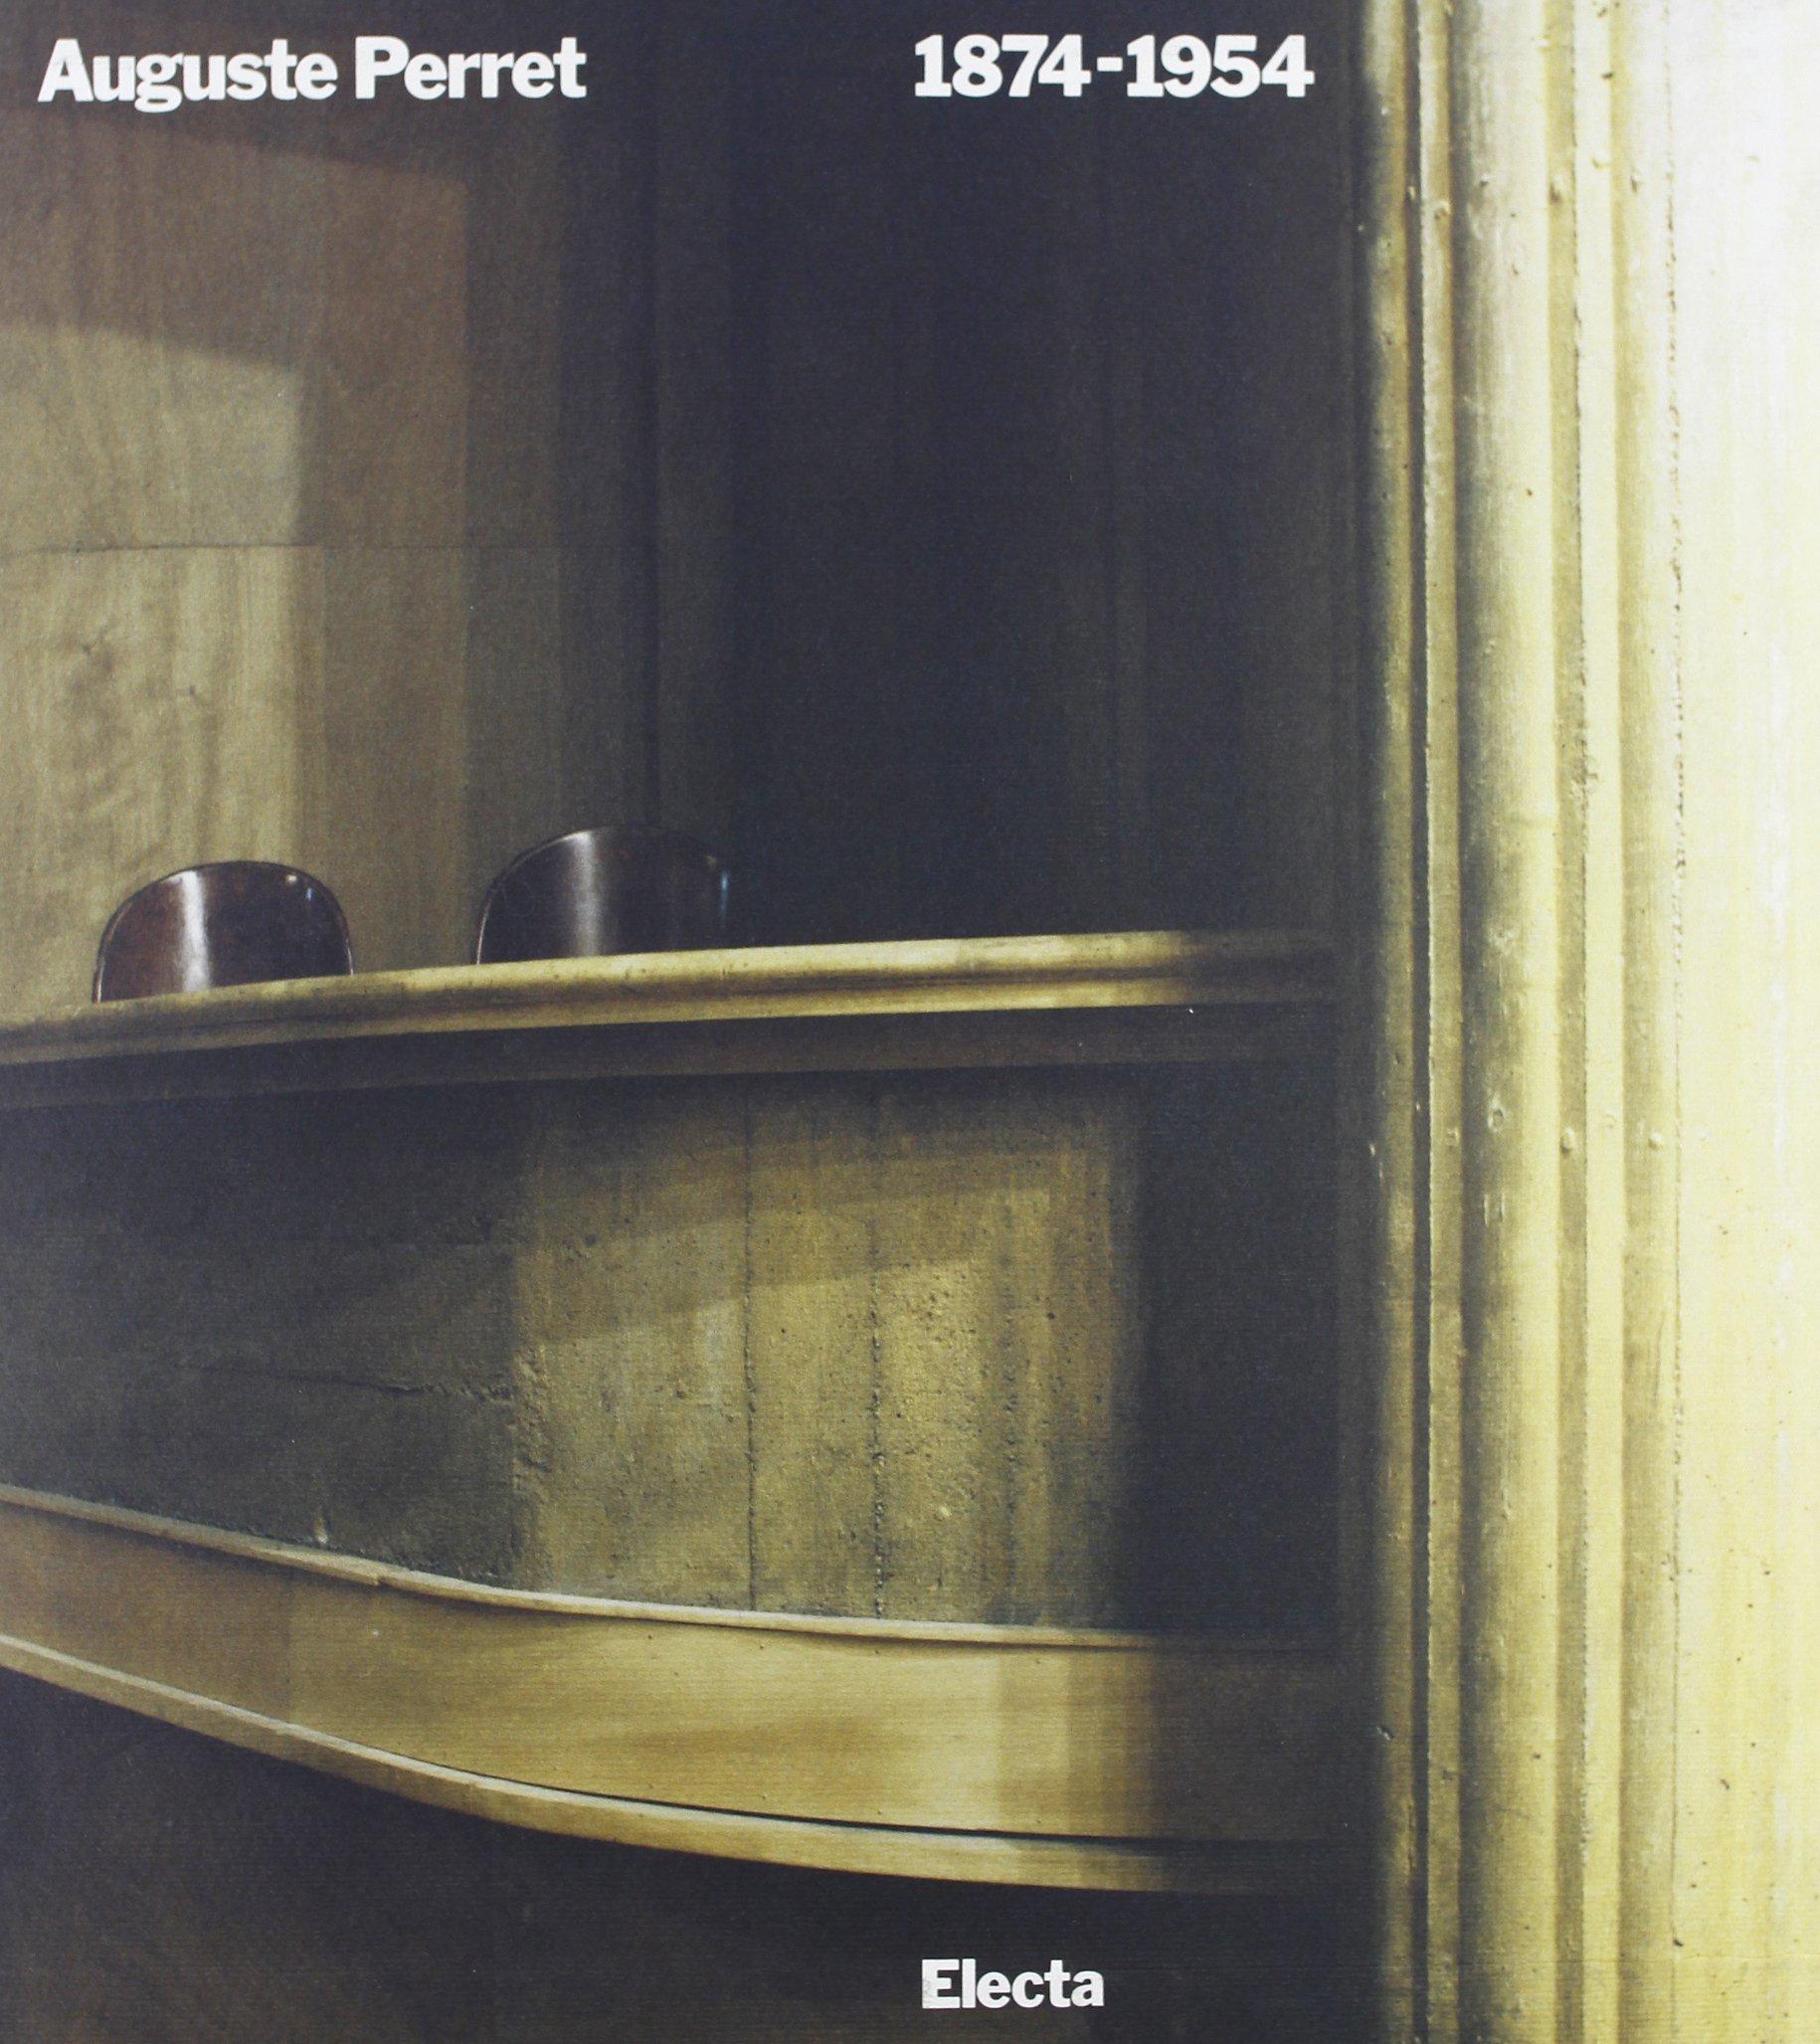 Auguste Perret (1874-1954). Teoria e opere. Ediz. illustrata Copertina rigida – 1 gen 1997 Roberto Gargiani Mondadori Electa 8843542508 ARCHITETTURA